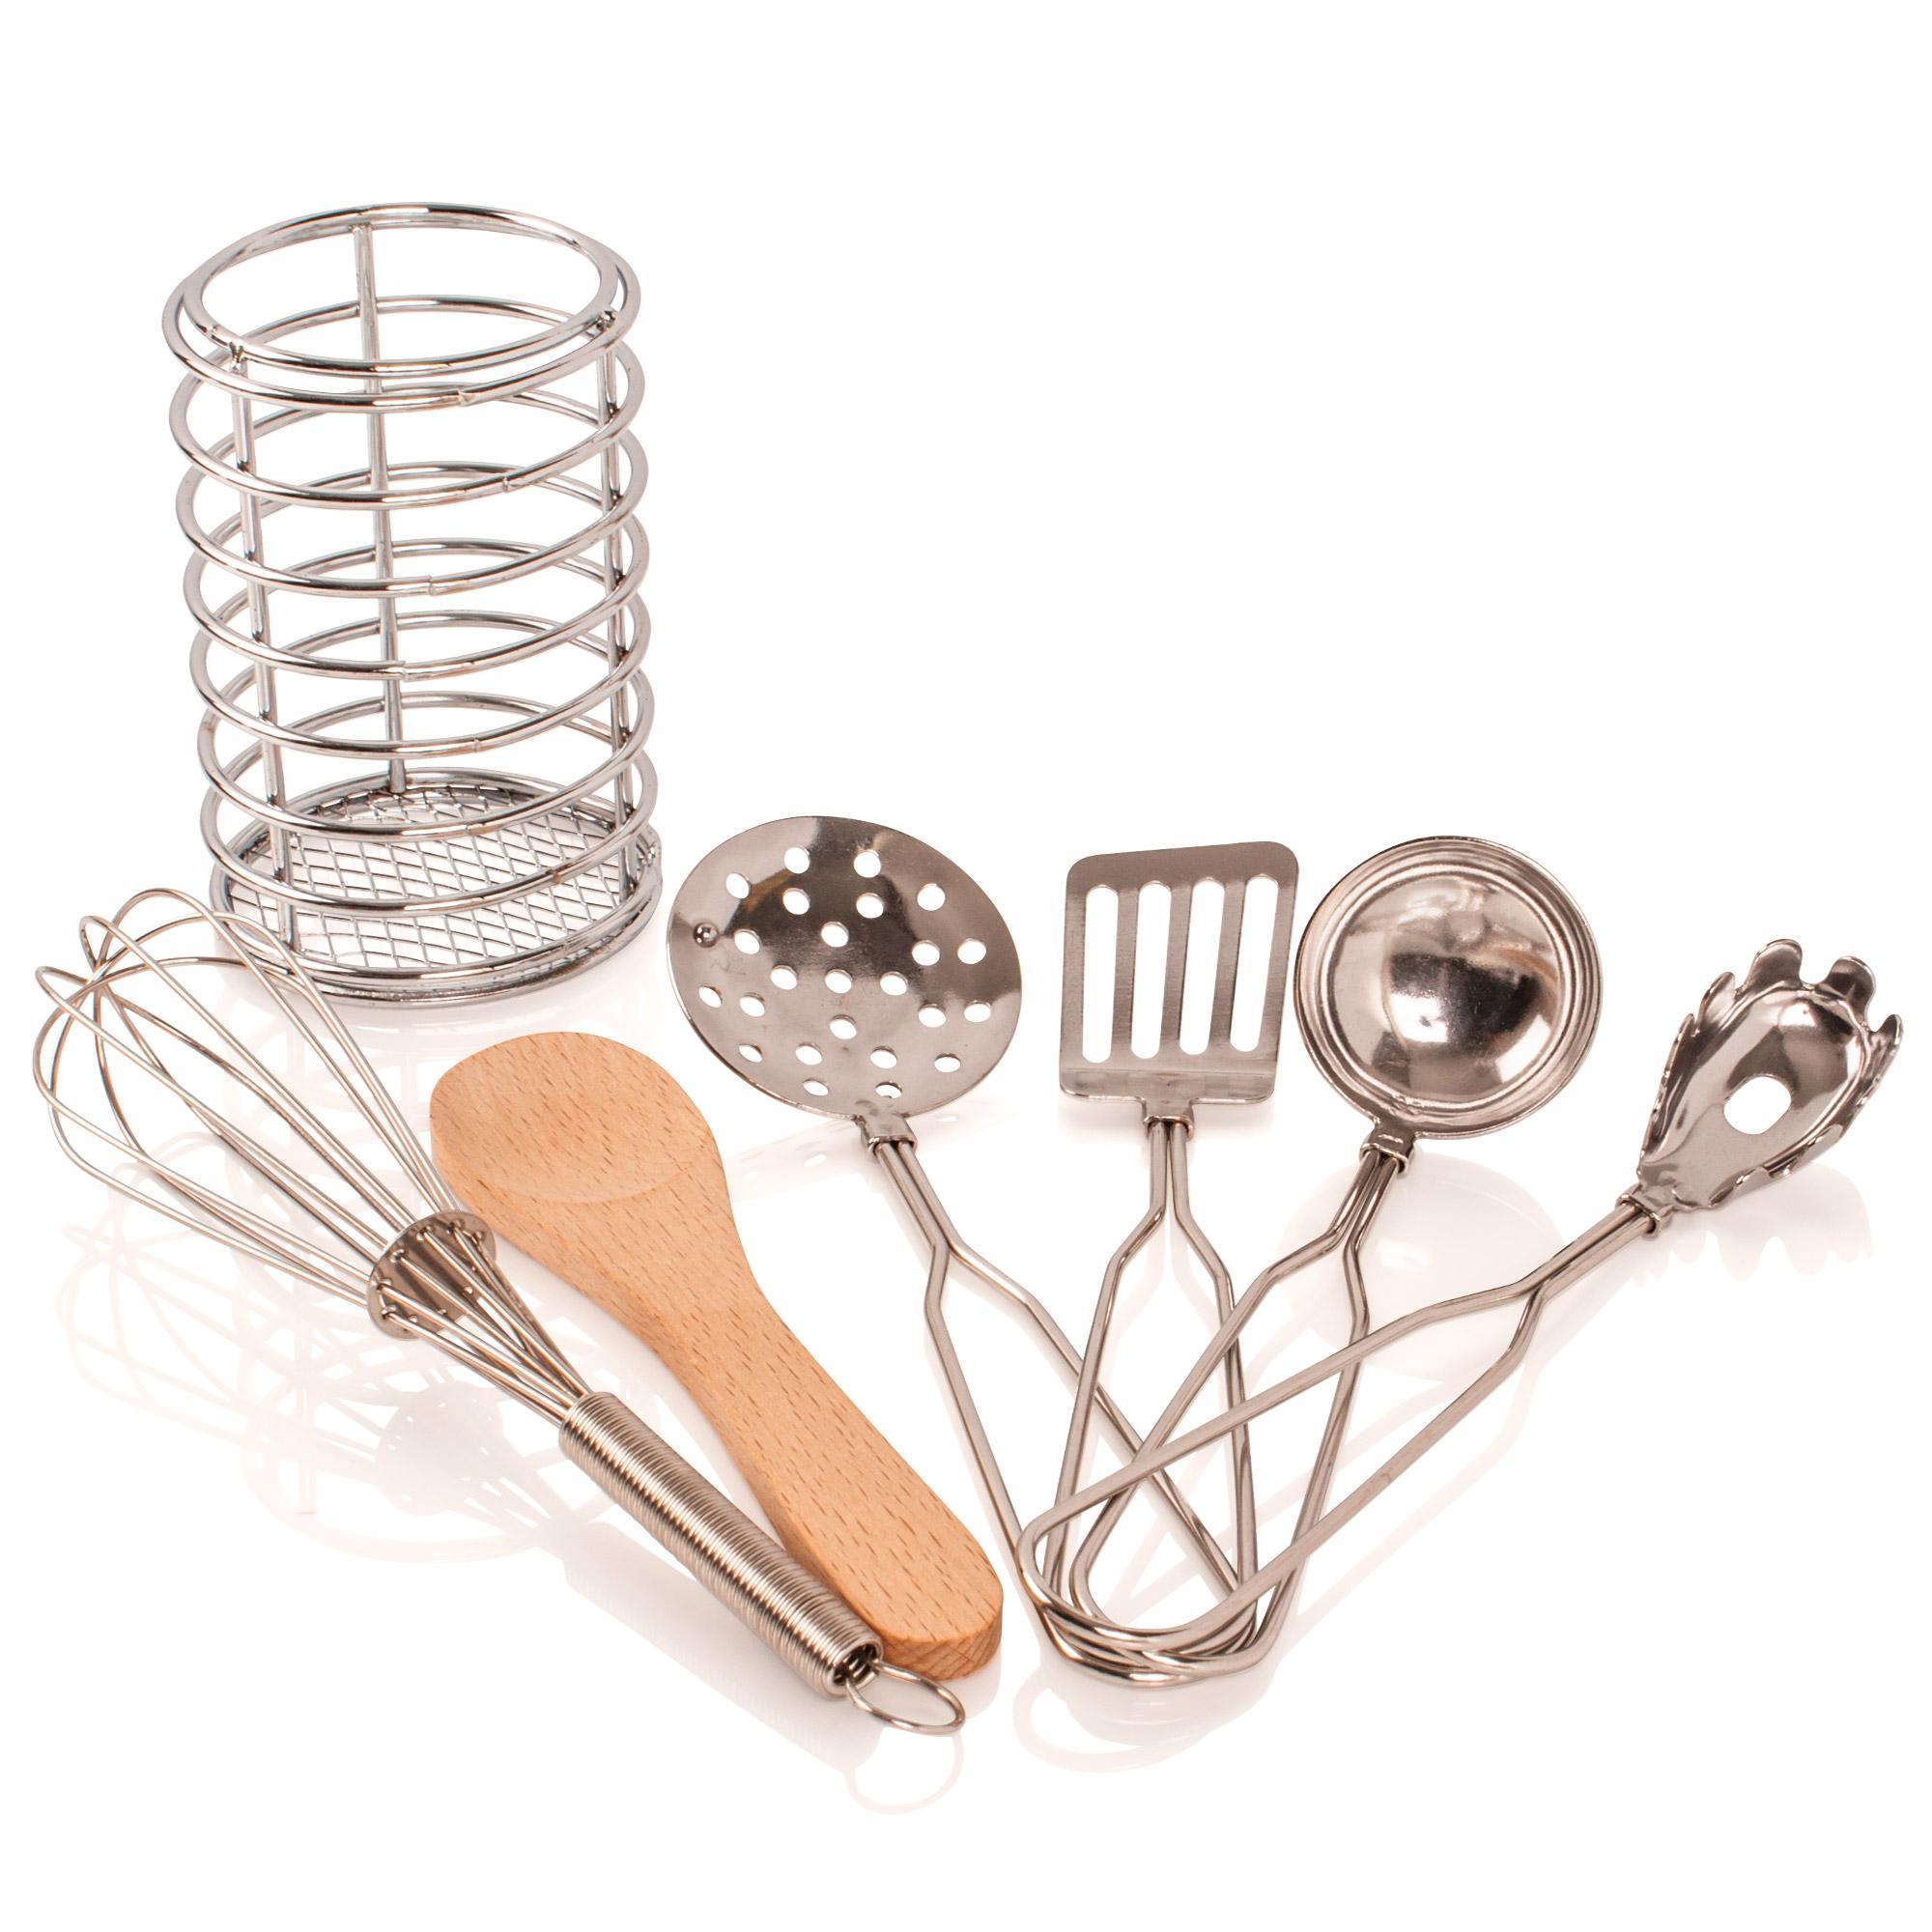 Childrens Kids 7 Piece Play Toy Kitchen Utensil Cooking Cookware Accessories Set Ebay